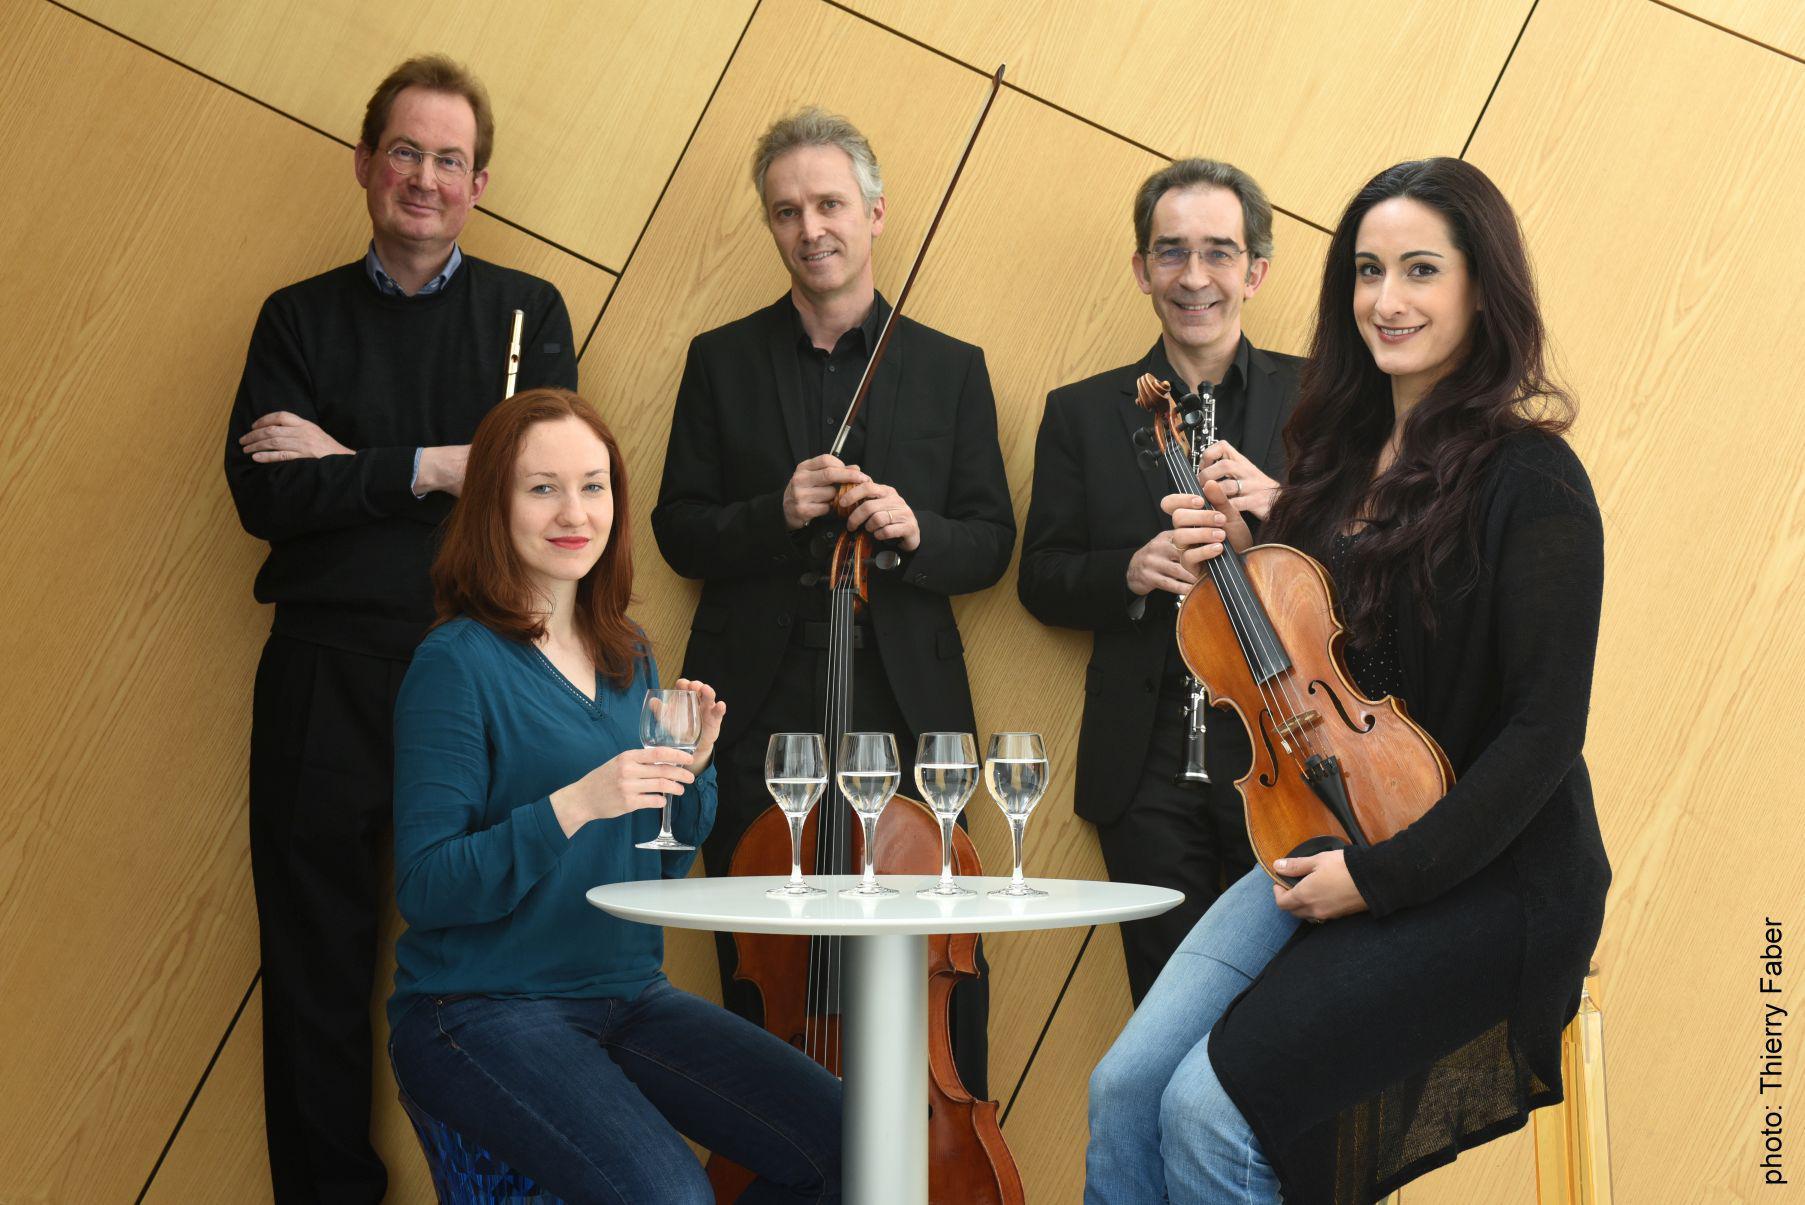 Concert-apéritif 02.04.2018 : Brönnimann Germani Guignard Kerber Gérin Bloch